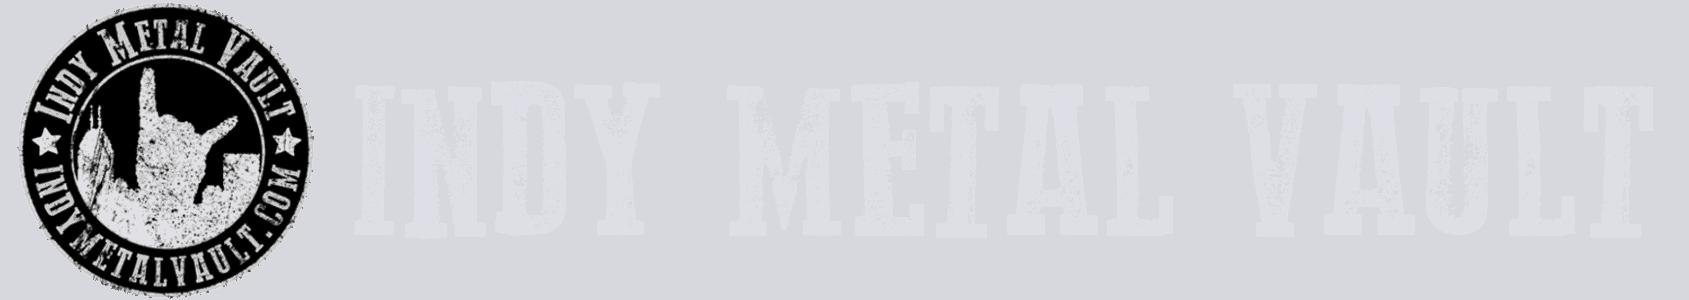 Indy Metal Vault Logo